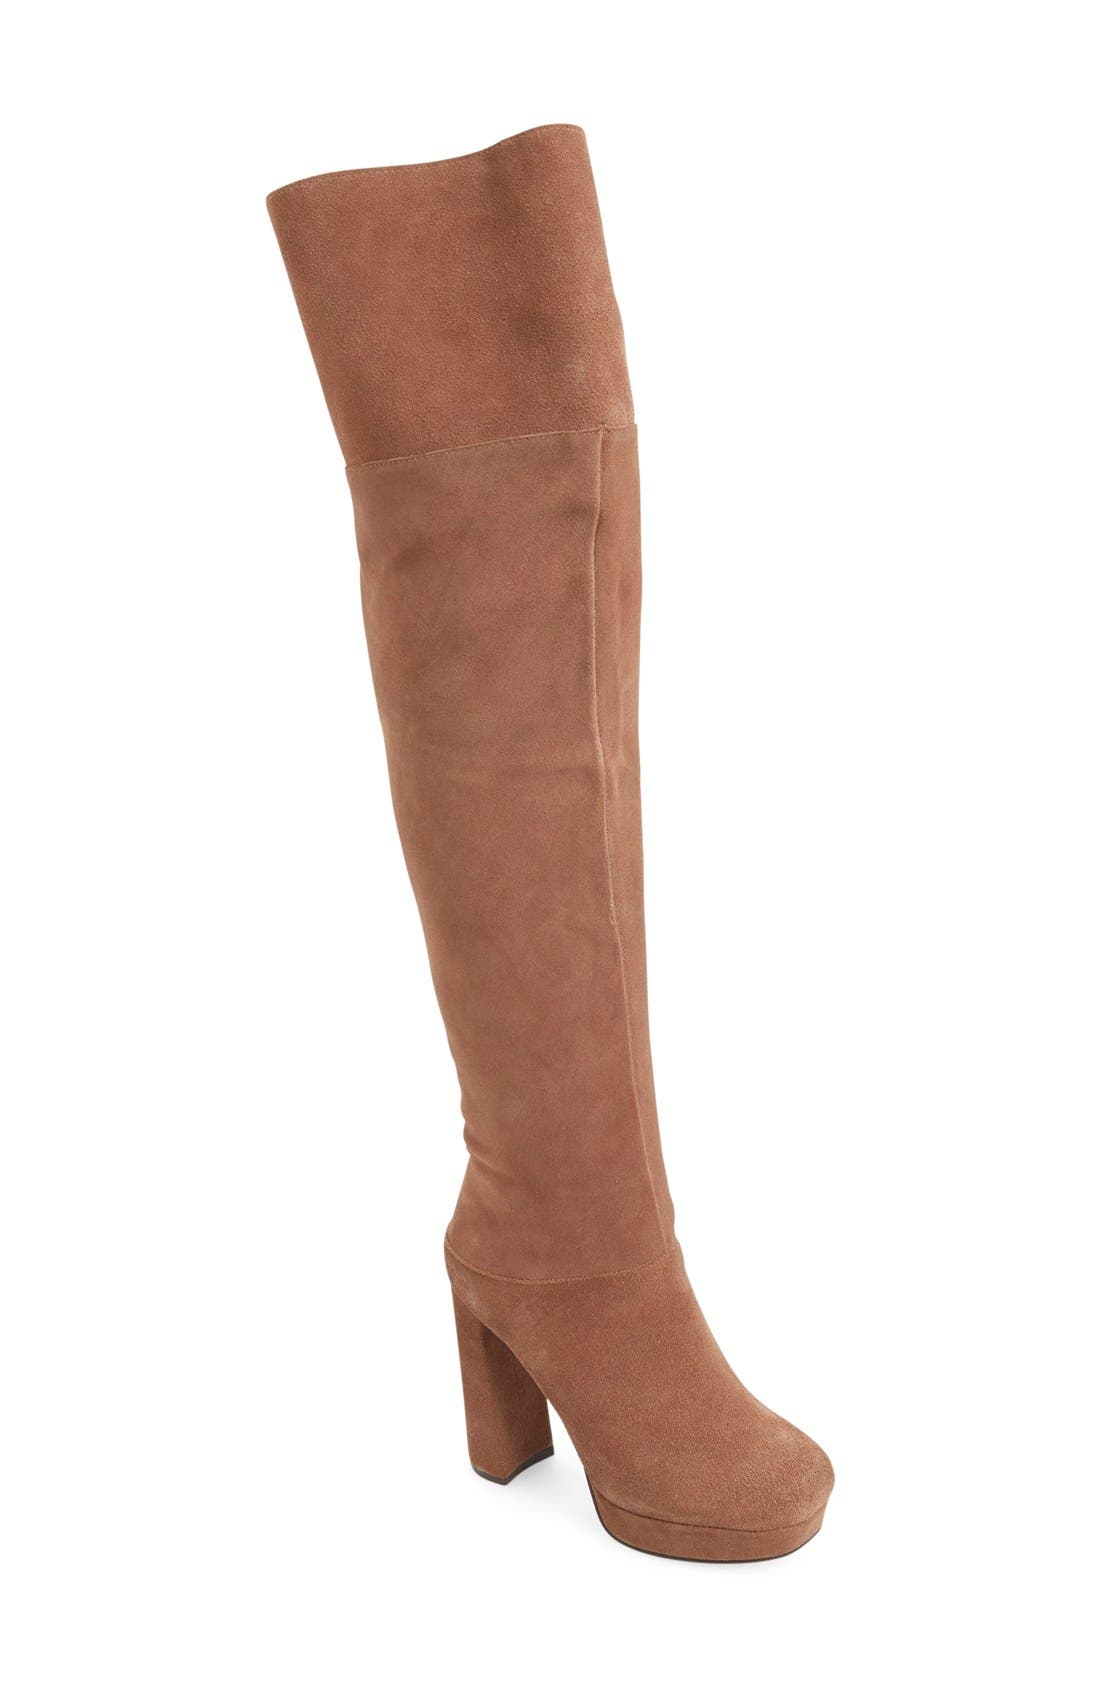 Alternate Image 1 Selected - Jeffrey Campbell 'Destino' Over the Knee Platform Boot (Women)